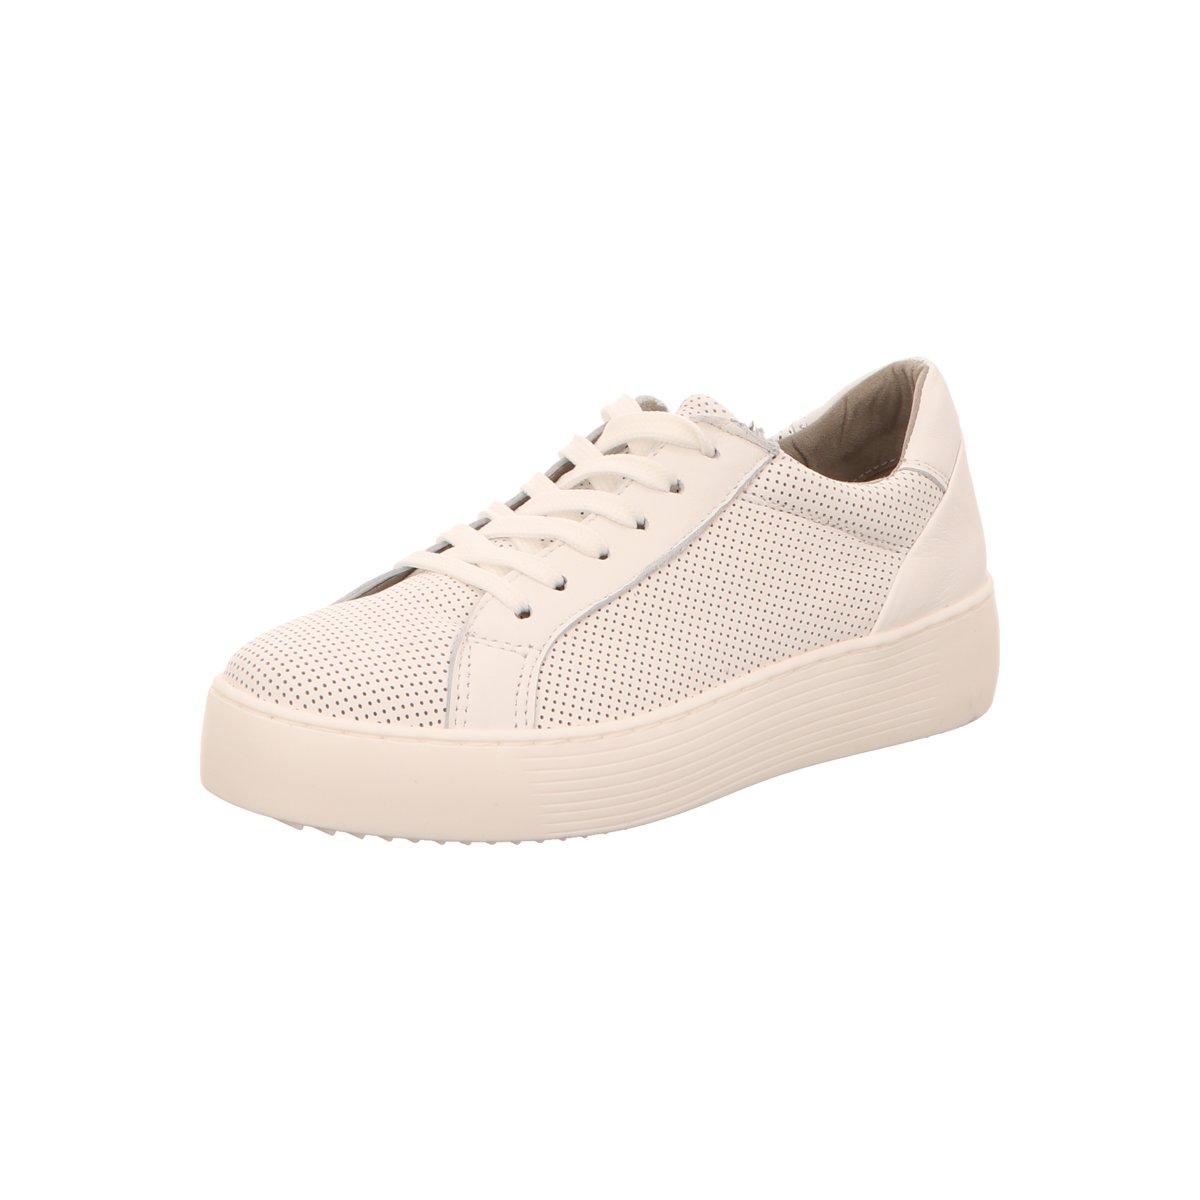 1-23759-20 Damen Sneakers Weiß, EU 38 Tamaris